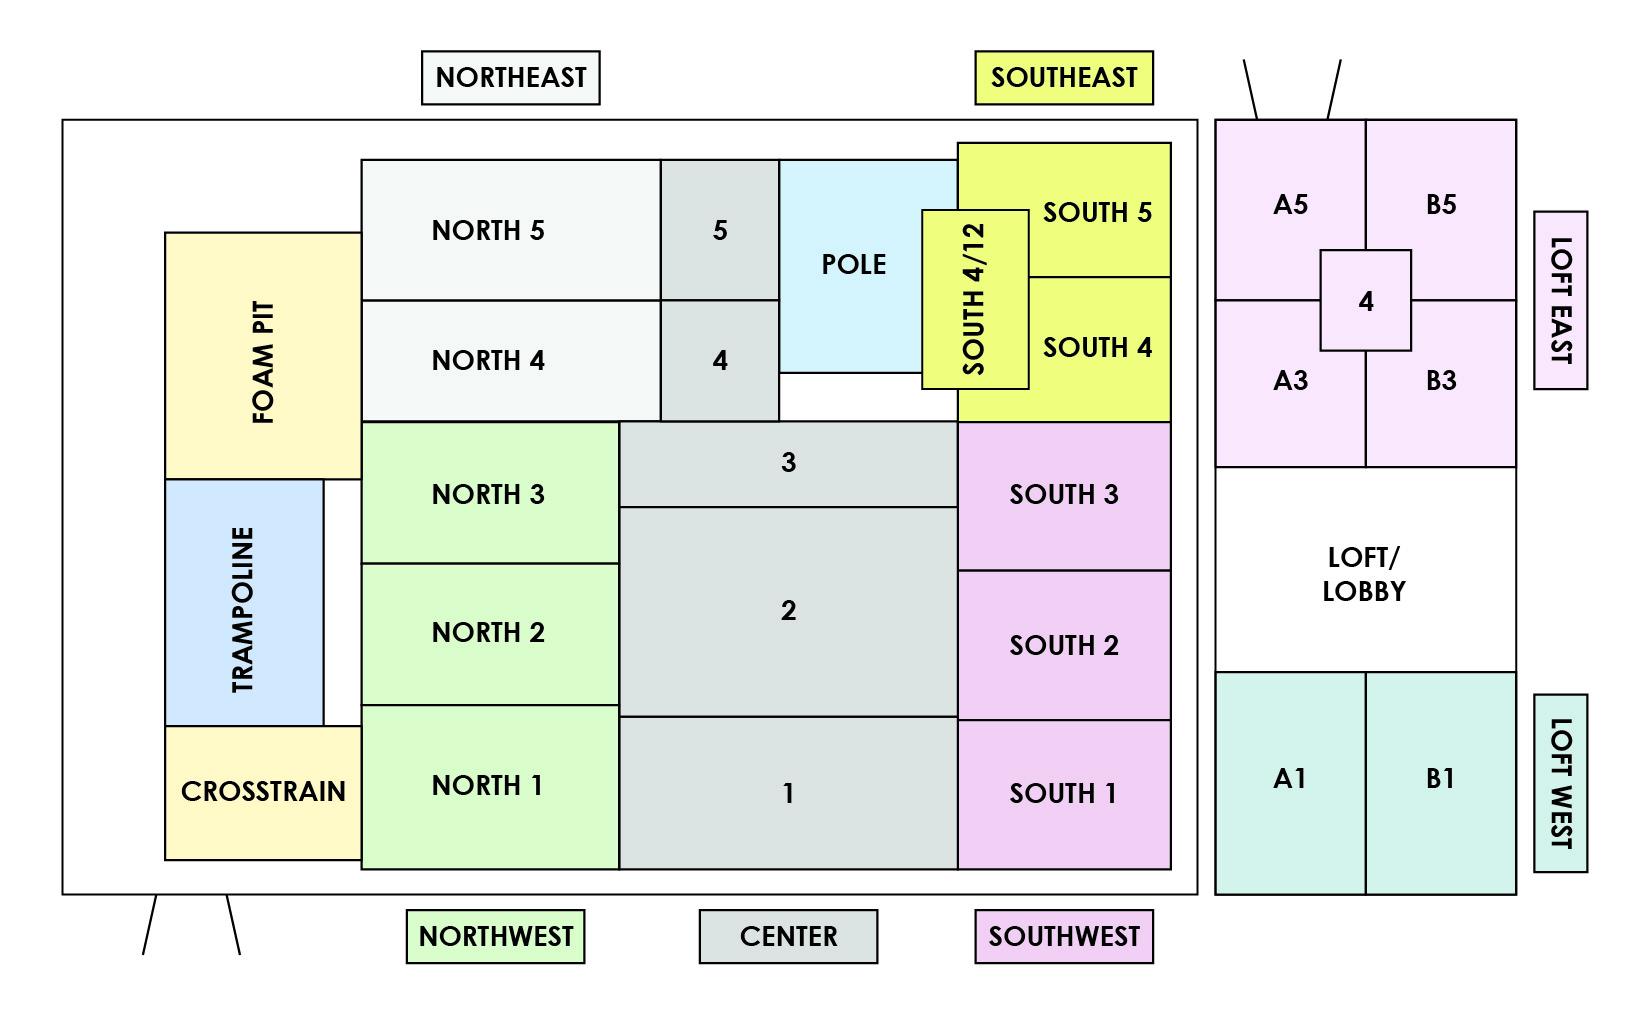 photo of the layout of the NECCA training studio